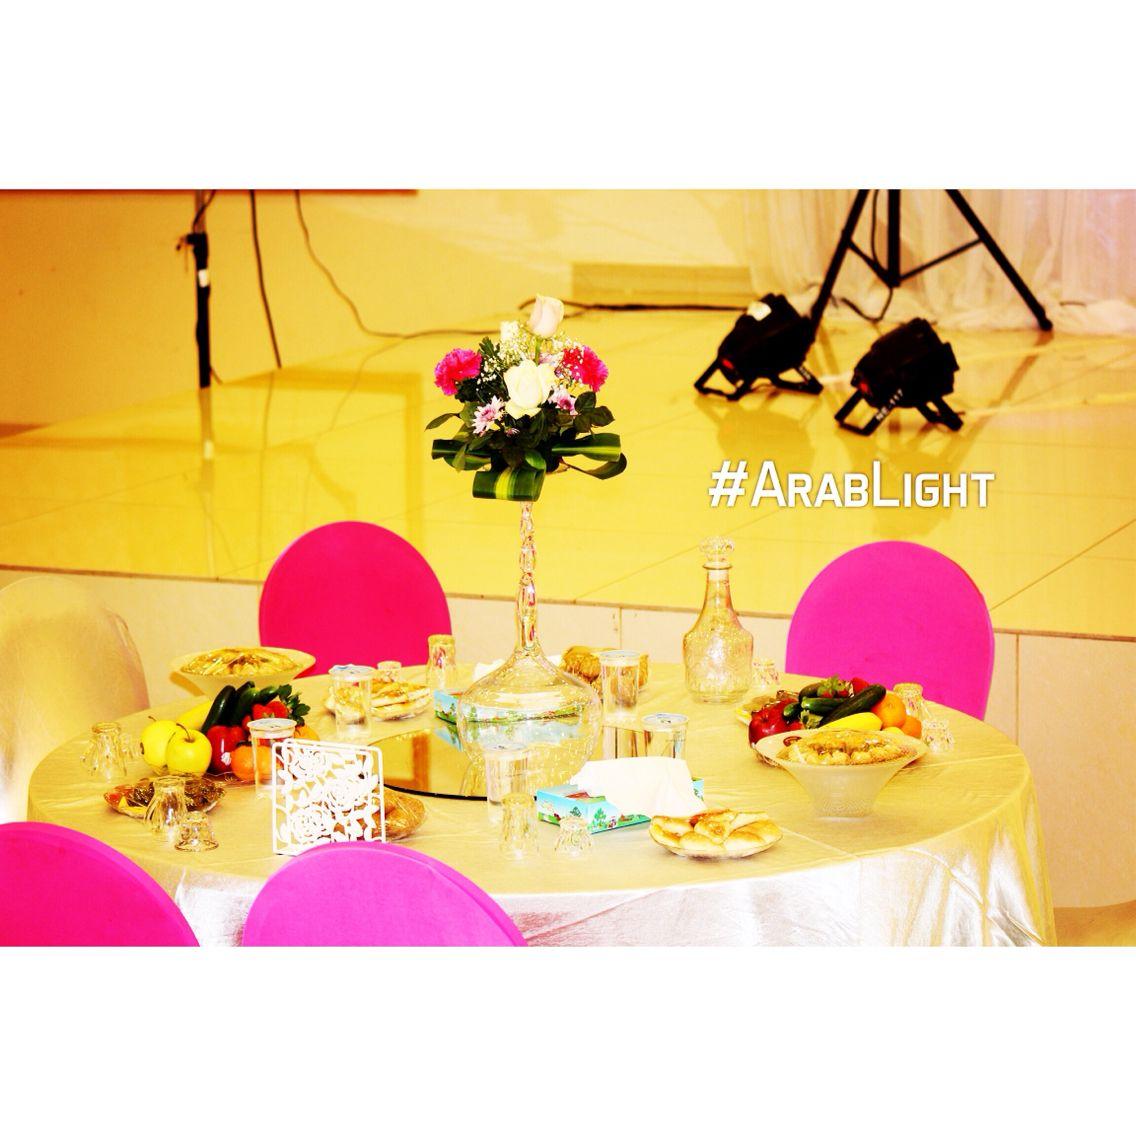 Event Party Wedding ابداع اراب لايت حفلات طاولات مناسبات مؤتمرات معارض كوشات مون لايت ليزر كوش 2015 تنسيق ورد Arab Desserts Royal Palace Cake